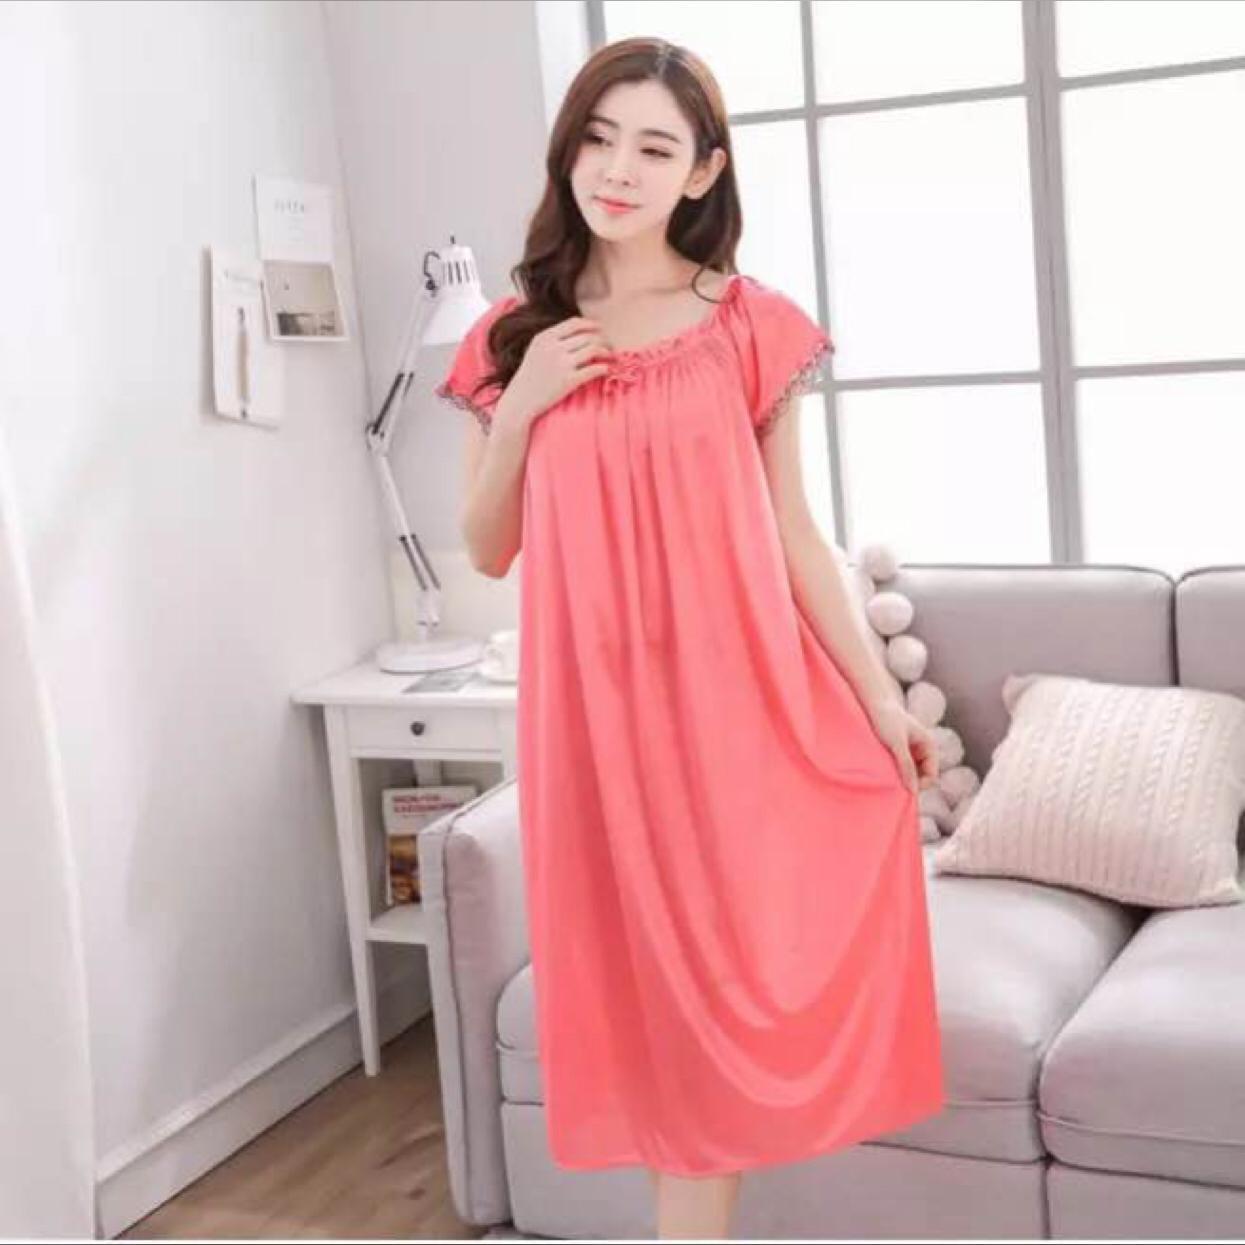 Banding Harga Daster Ukuran Xxl Murah Terbaru November 2018 Baju Tidur Piyama Jumbo Wanita 833 Besar Cantik Big Size Sleepwear